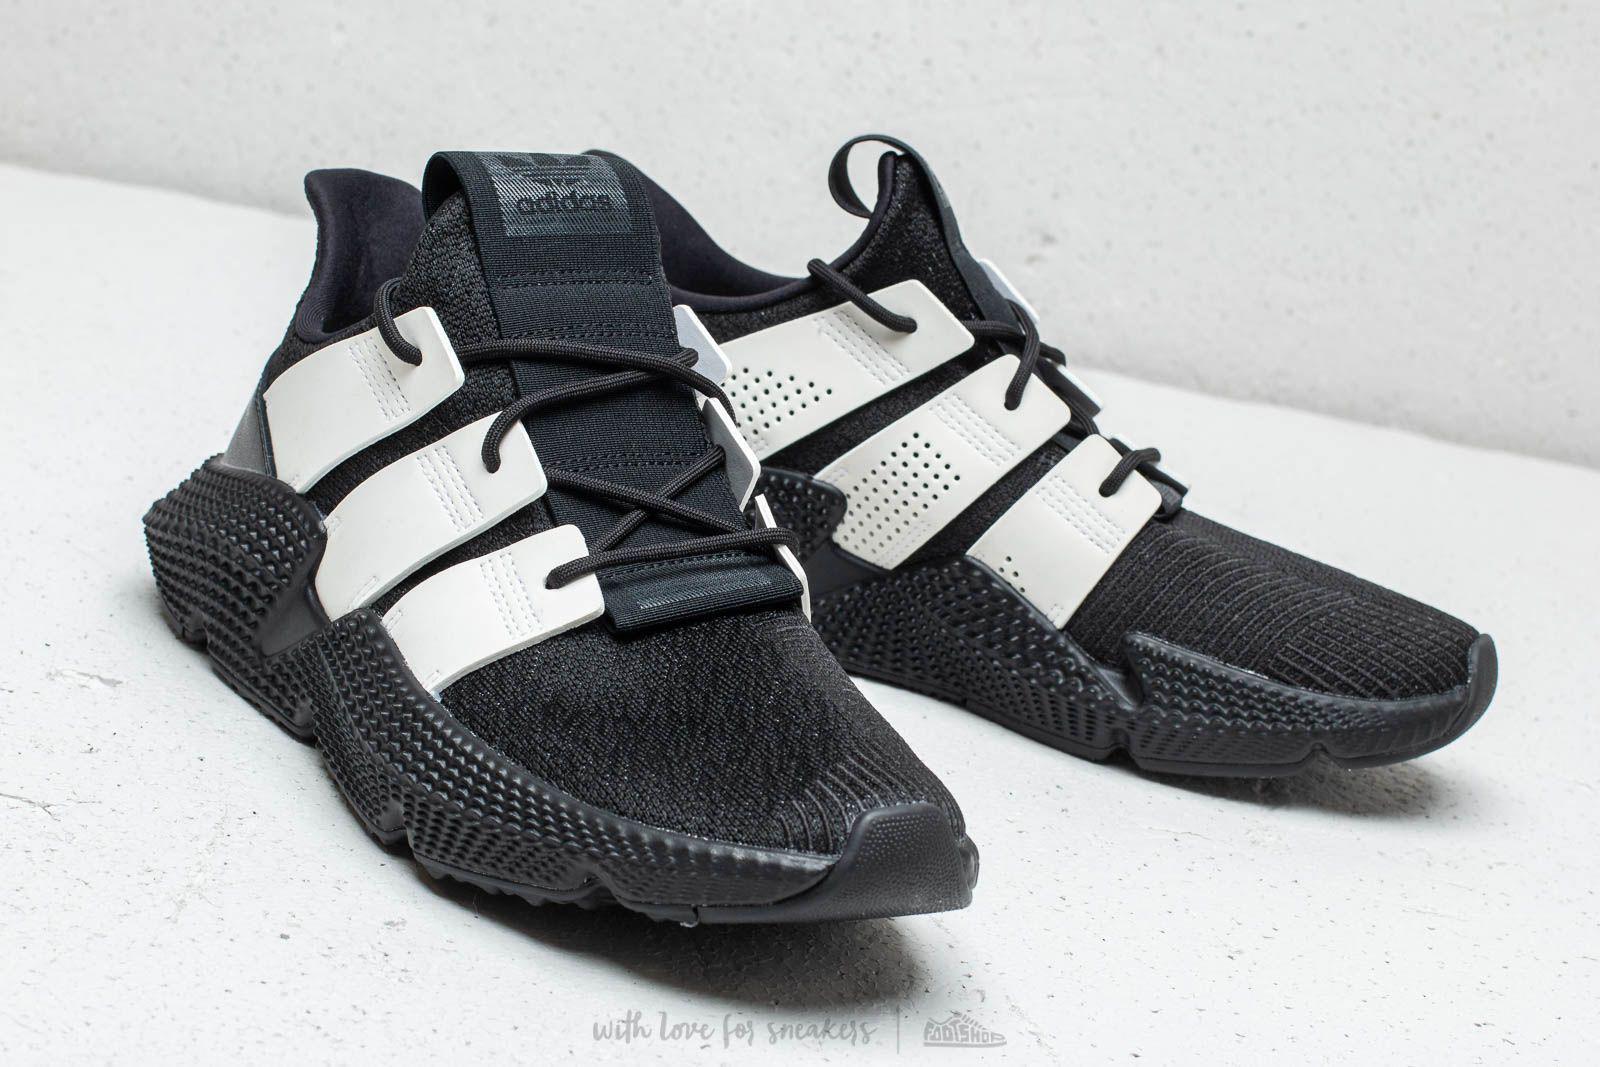 fb20d4163ab56 Lyst - adidas Originals Adidas Prophere Core Black  Ftw White  Shock ...